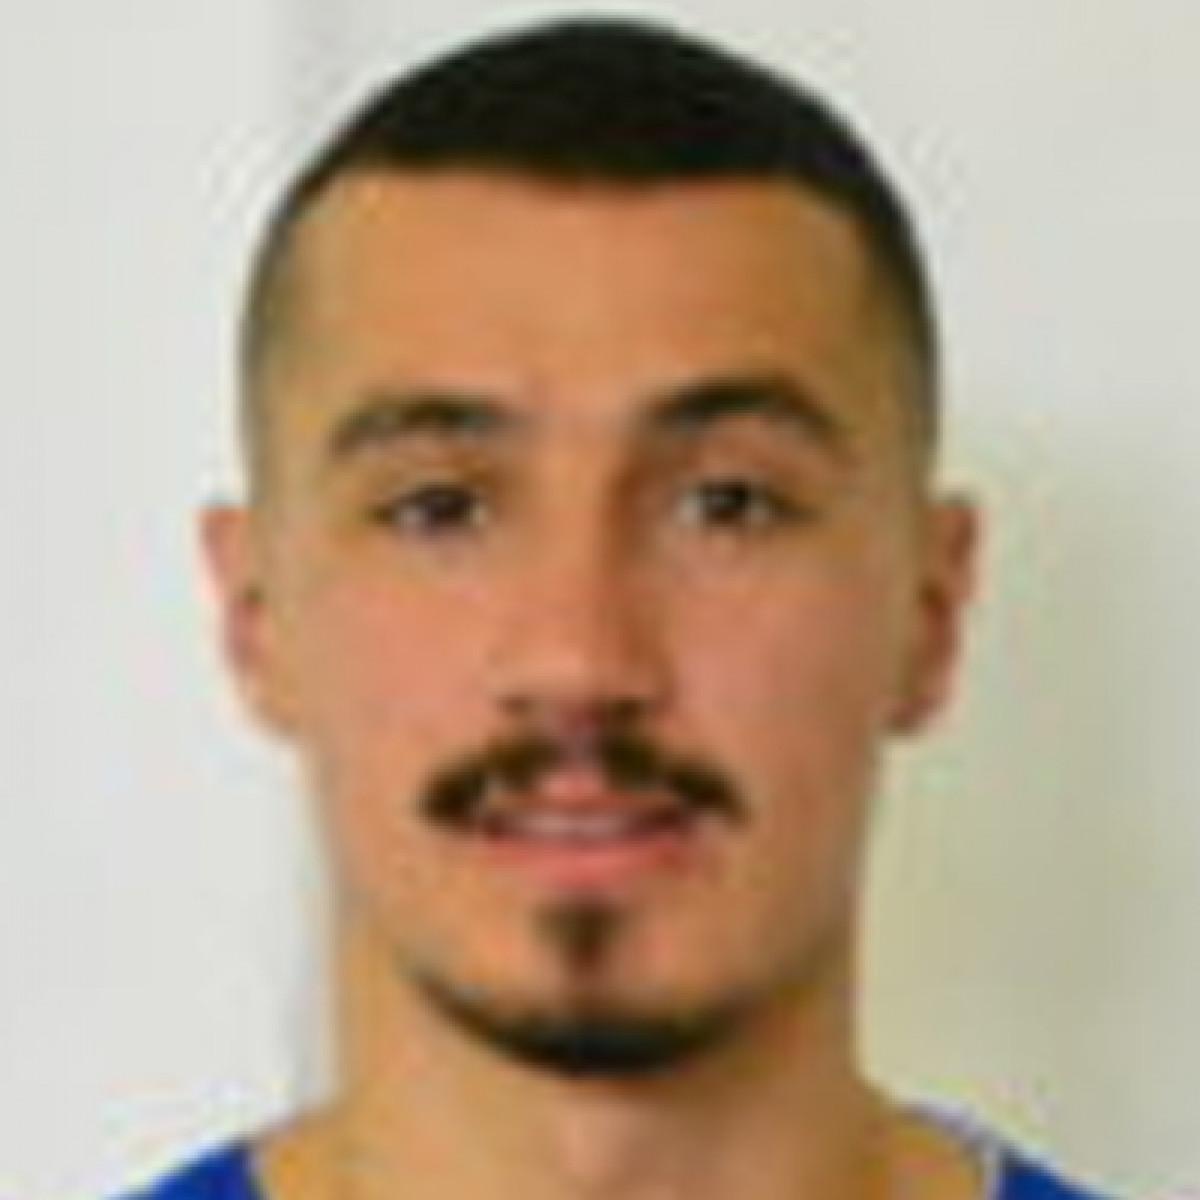 Manolis Kalatzis